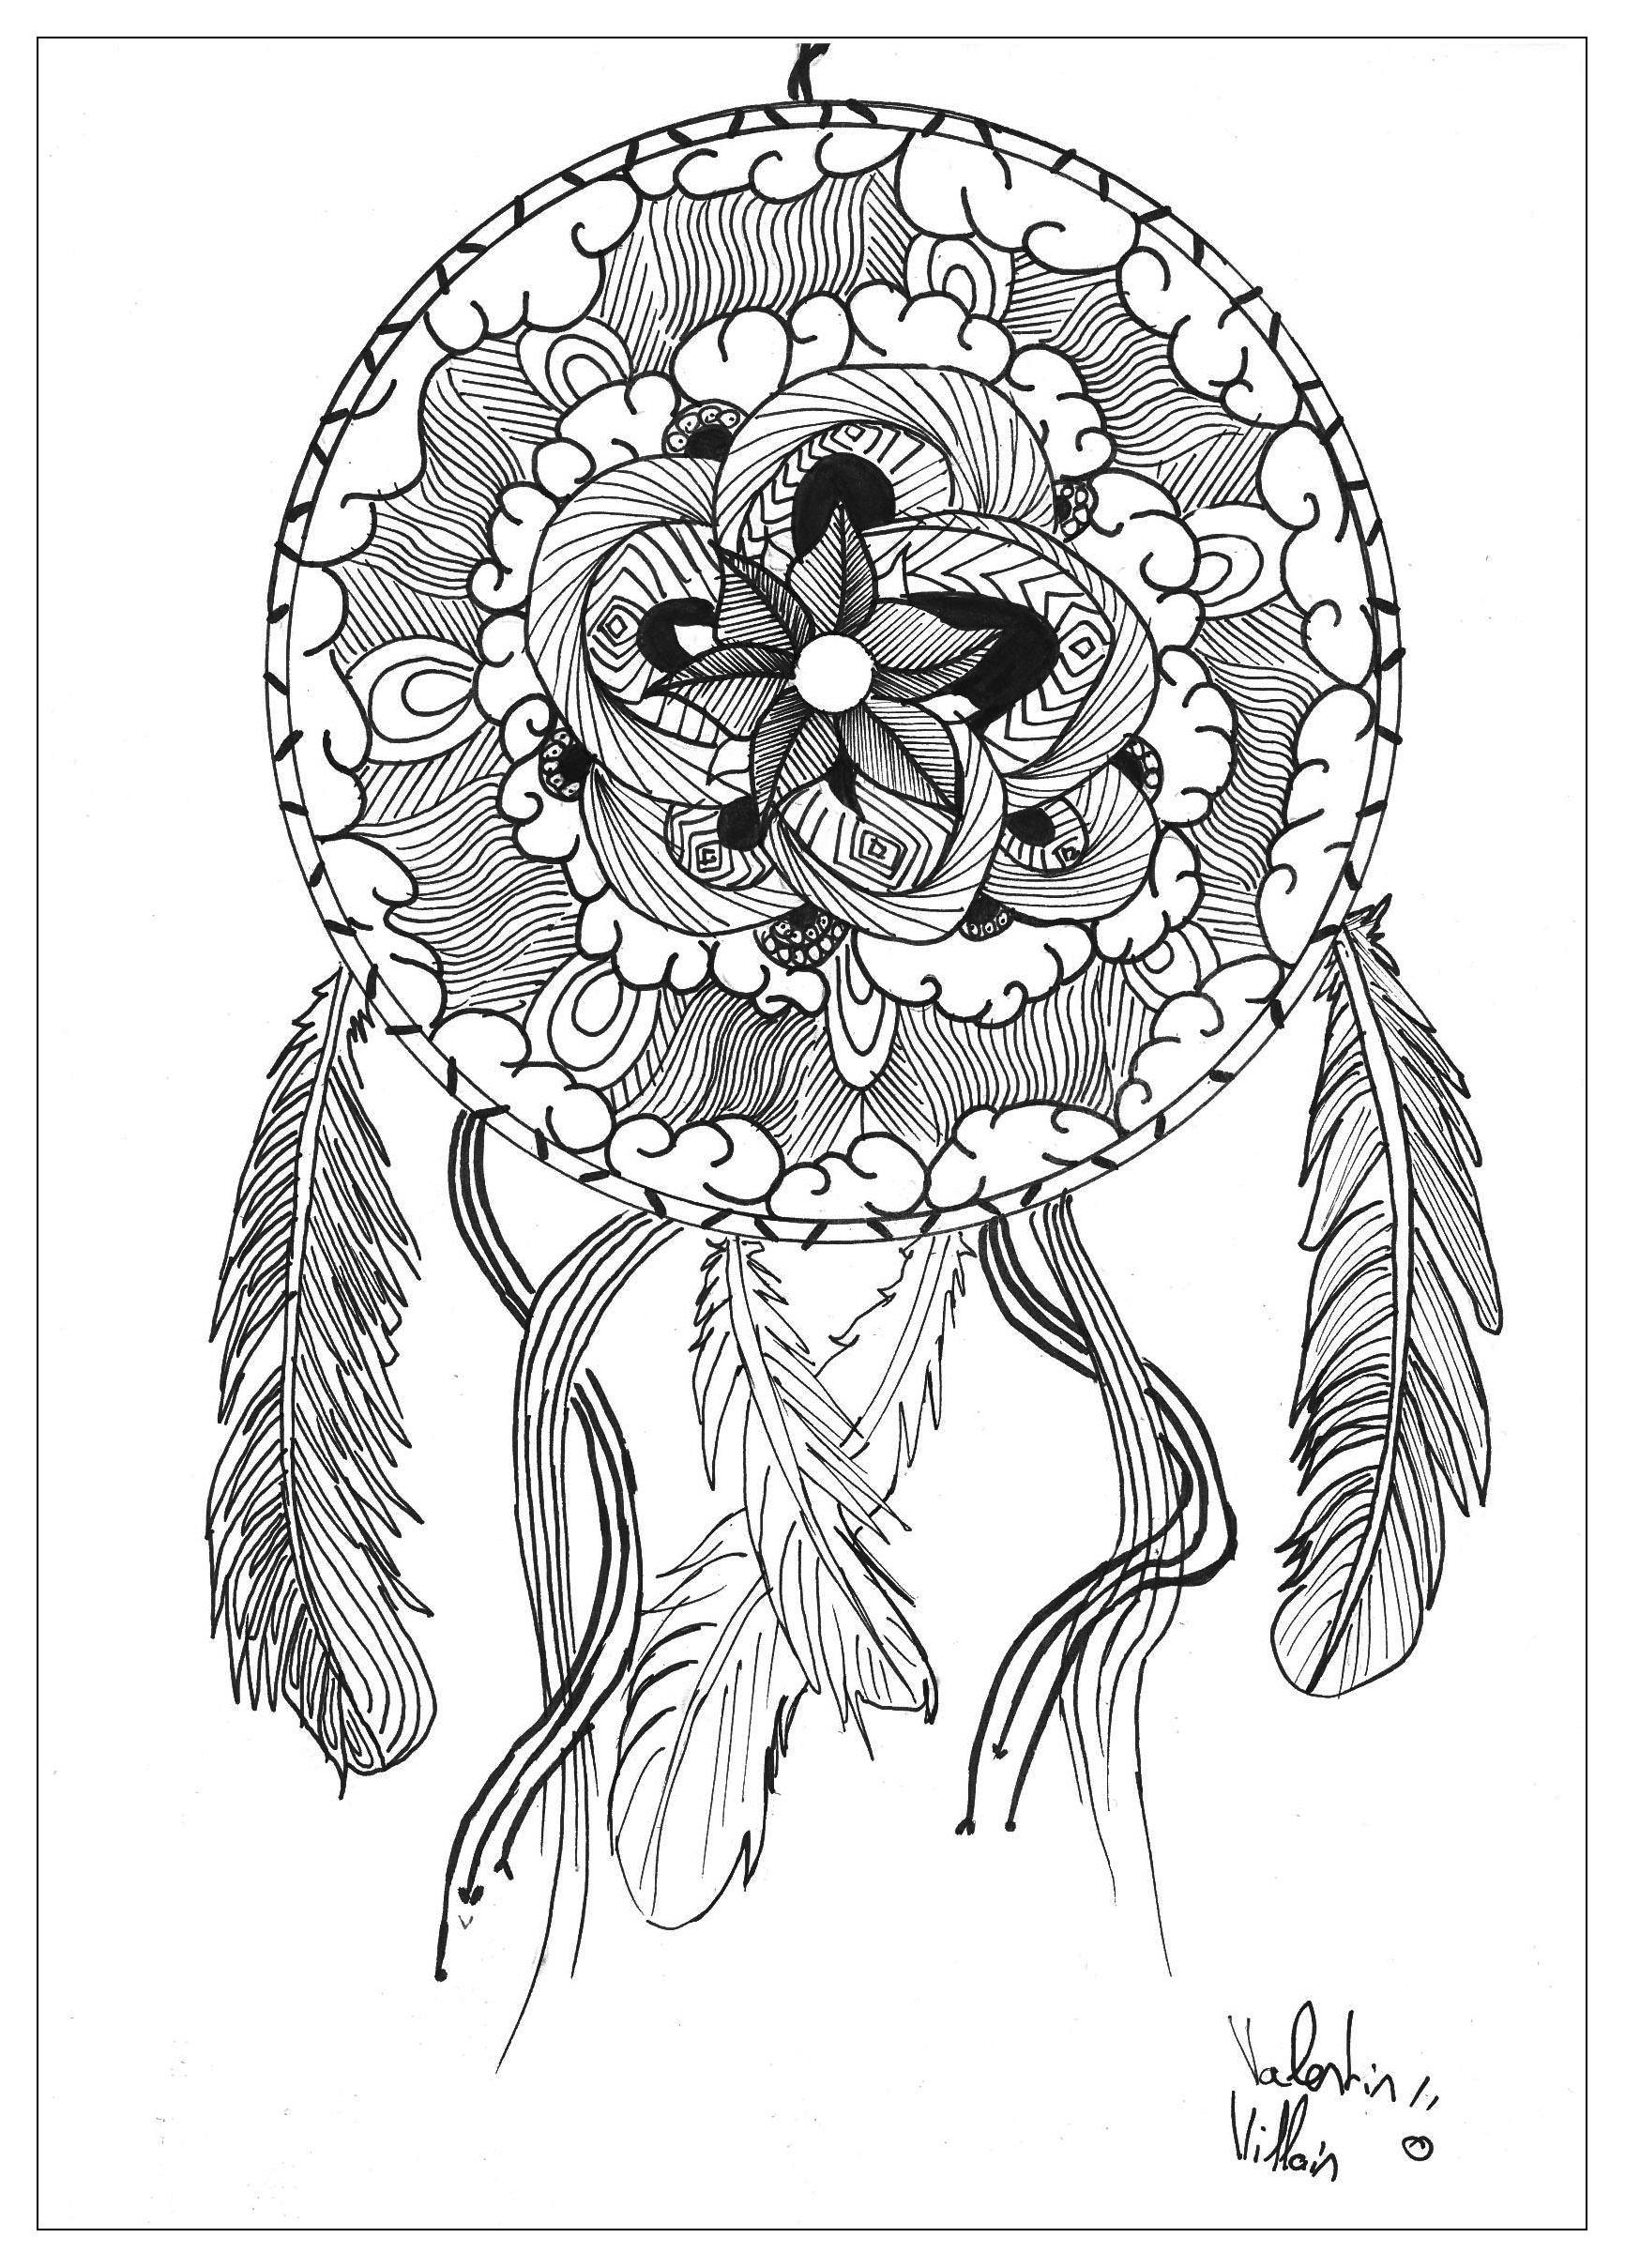 Dessin Mandala Capteur De Reve - Mandalas - Coloriages tout Dessiner Un Mandala